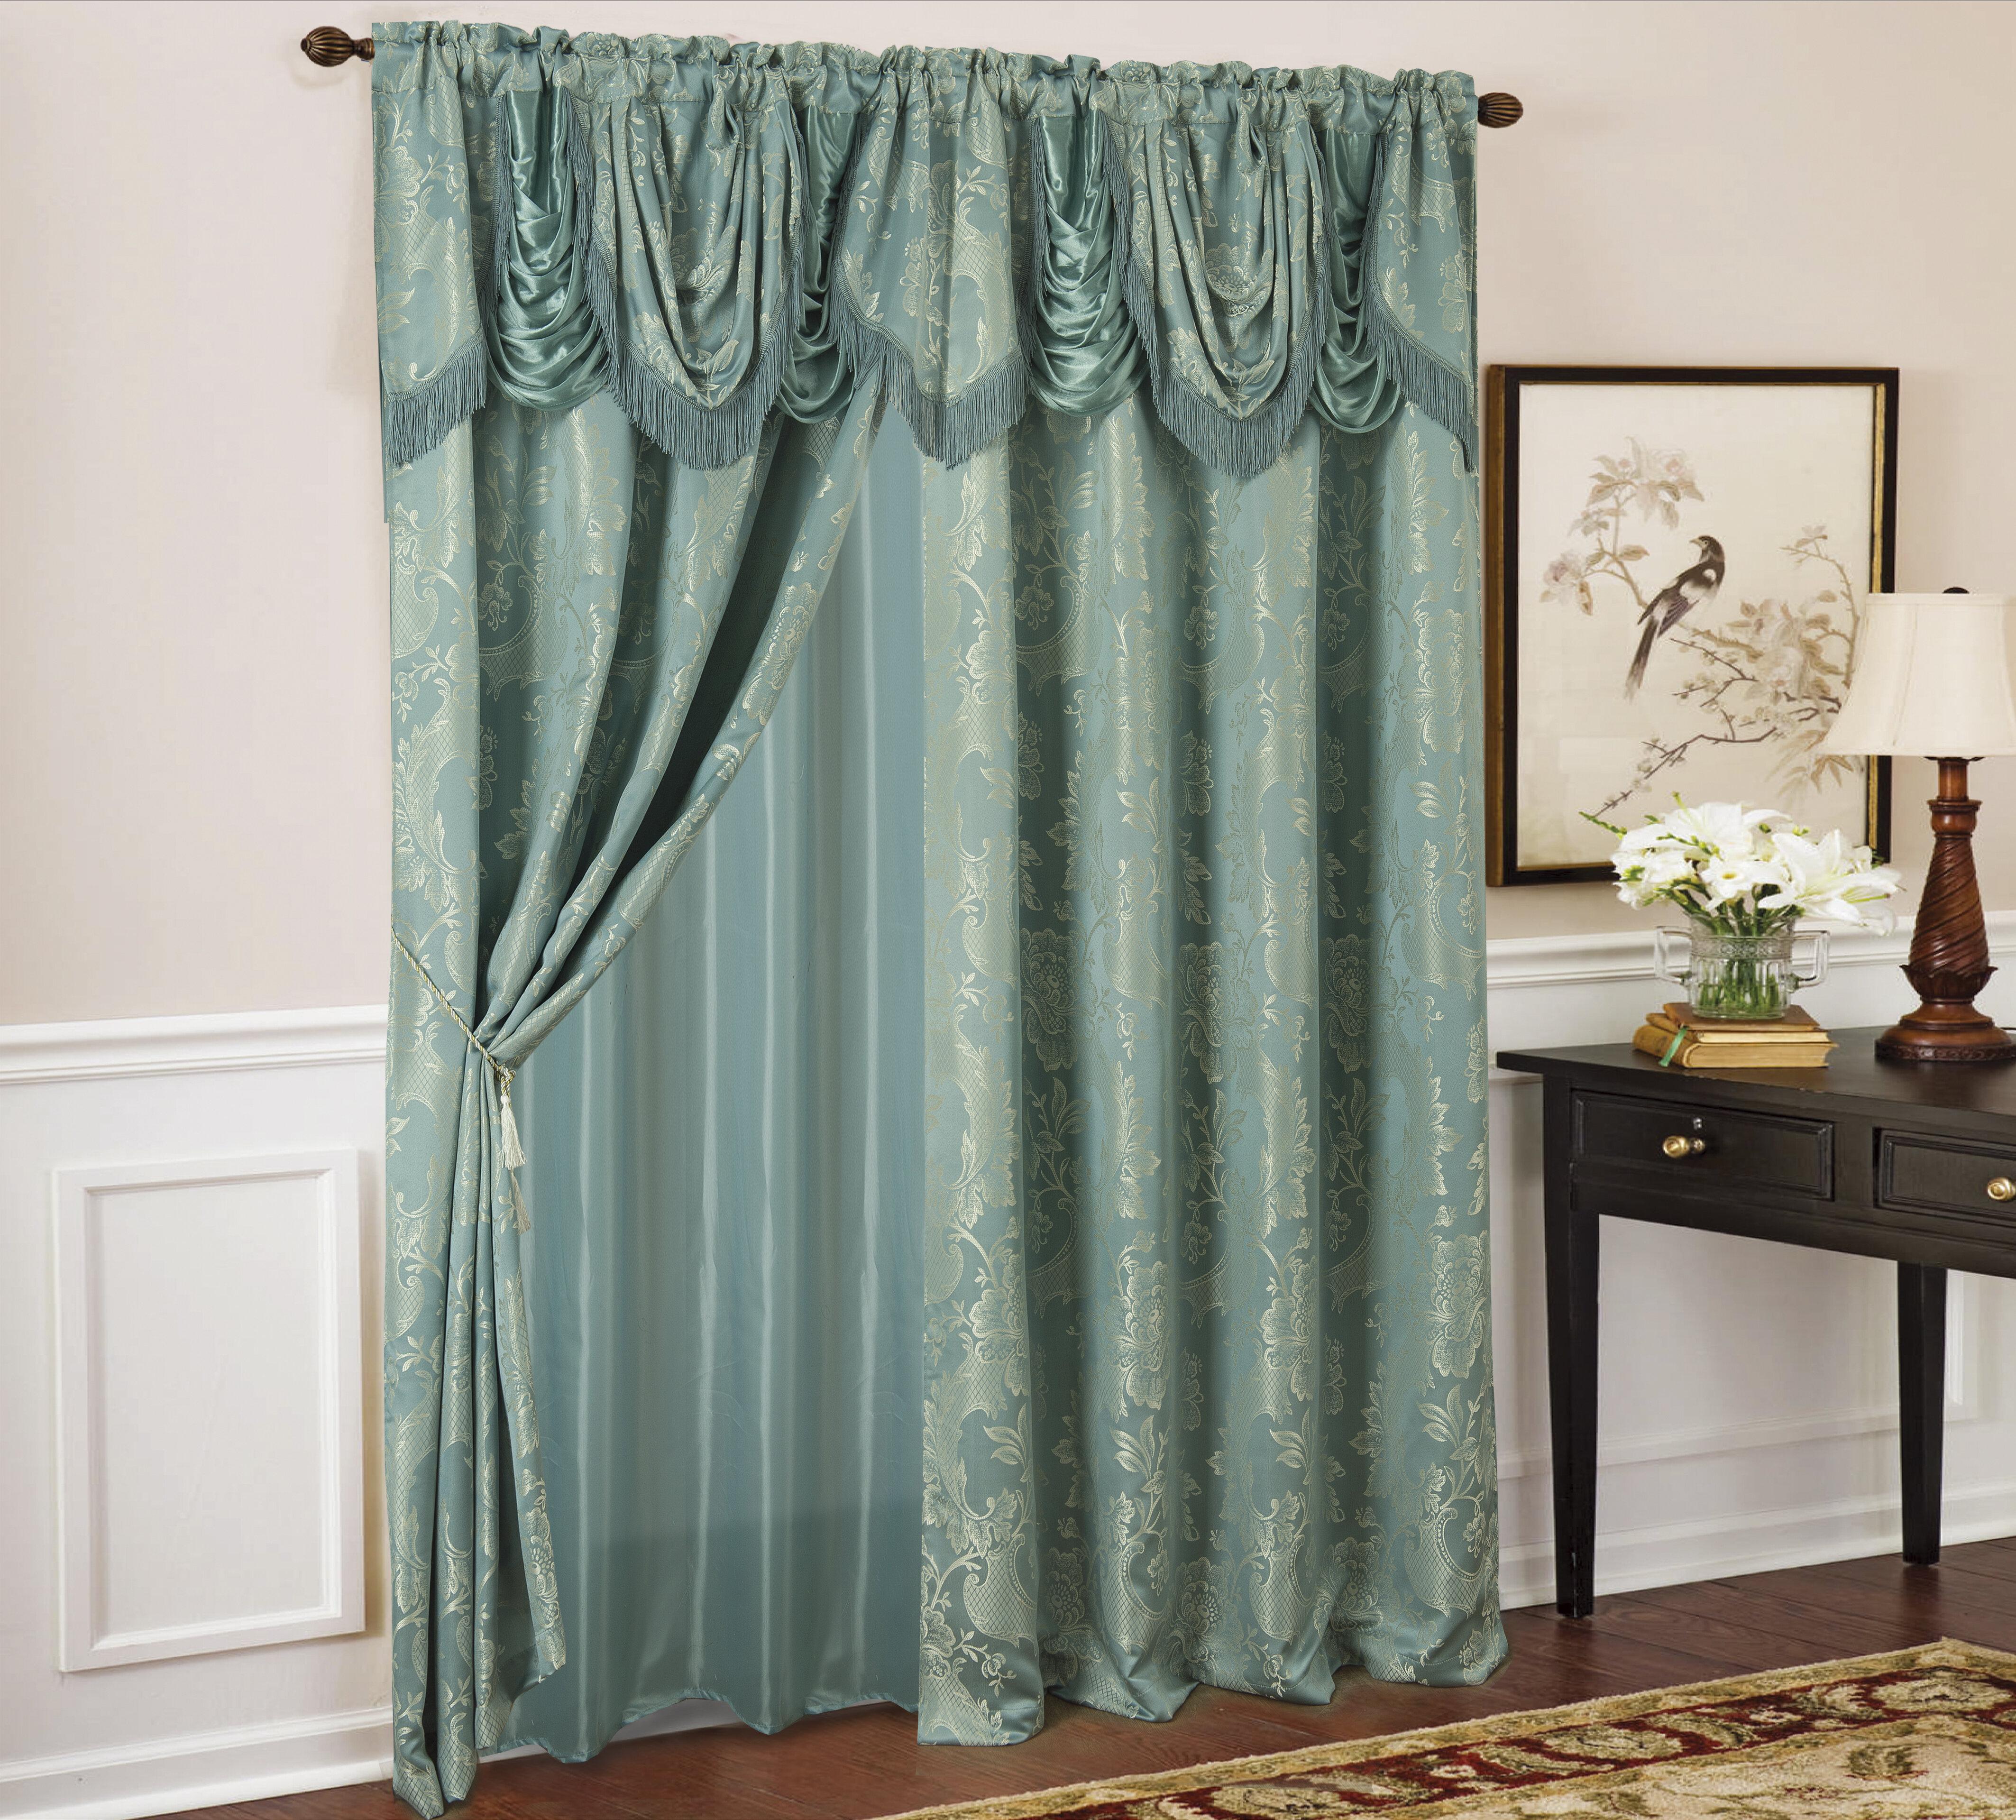 Astoria Grand Townsville Textured Jacquard Floral Rod Pocket Single Curtain Panel Reviews Wayfair